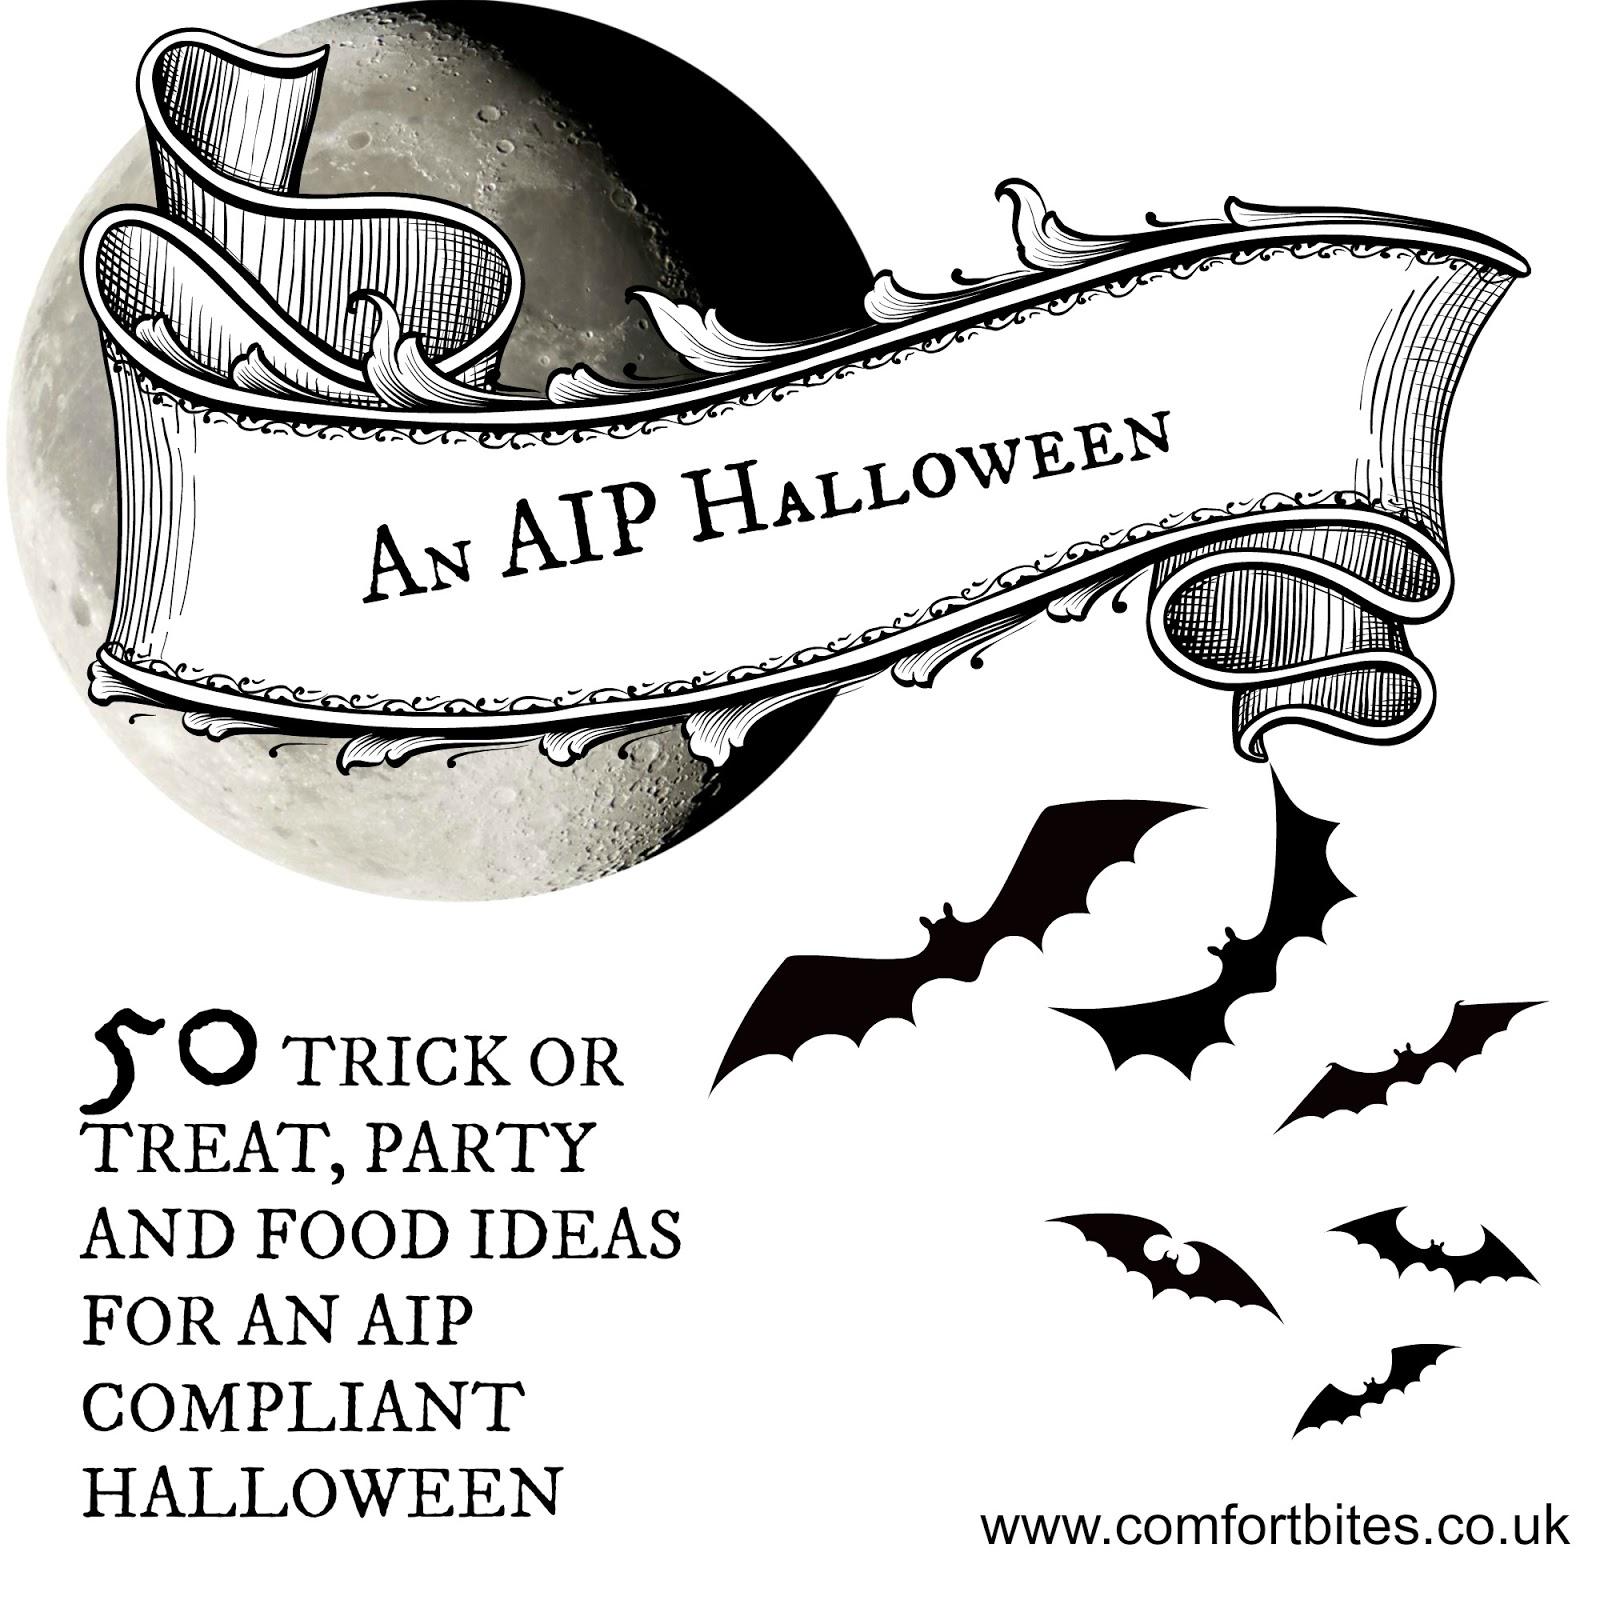 COMFORT BITES BLOG: 50 Spooky Ideas for An AIP Paleo Halloween (Boo!)